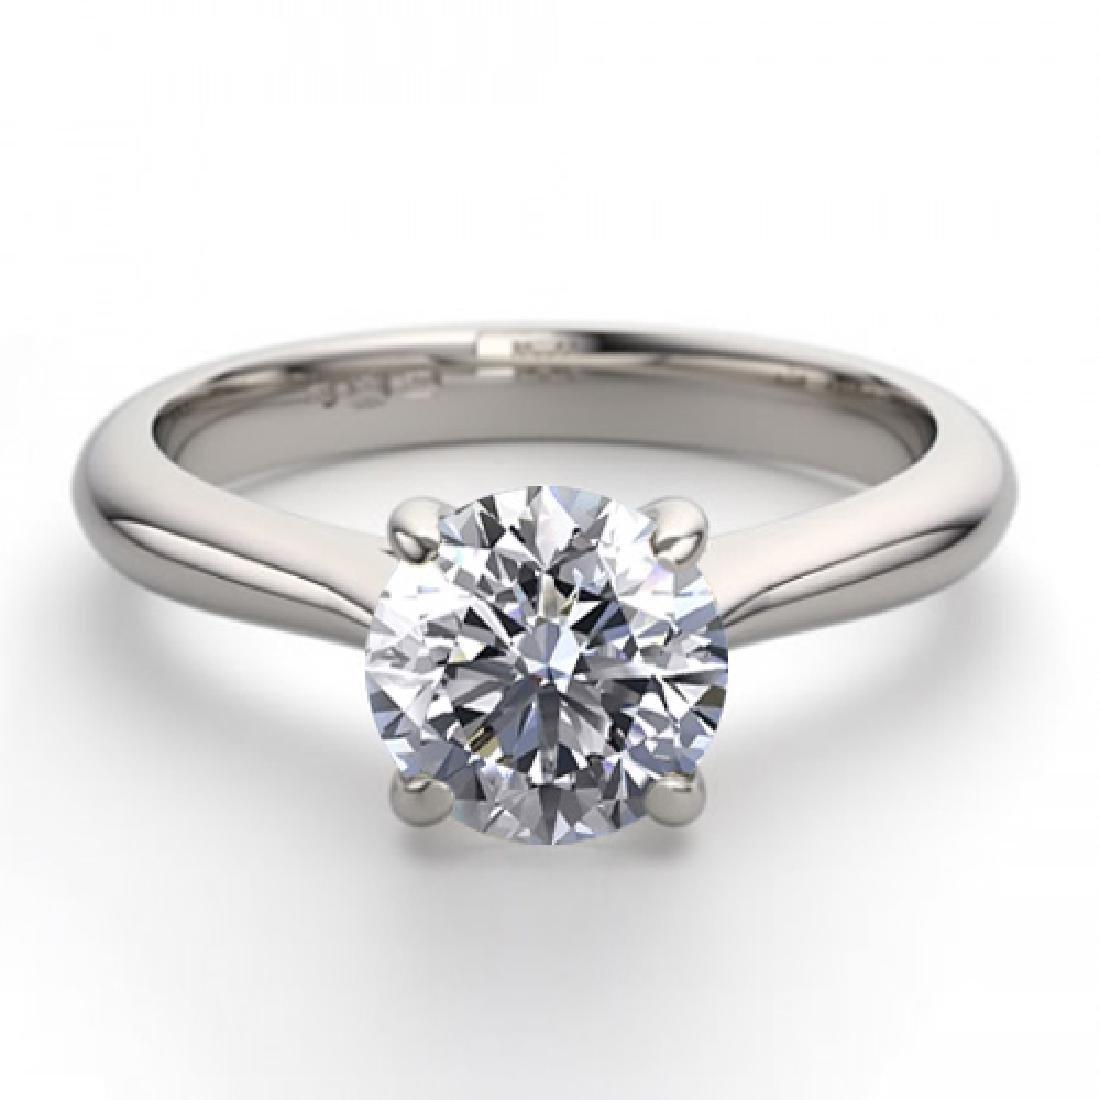 18K White Gold Jewelry 1.41 ctw Natural Diamond